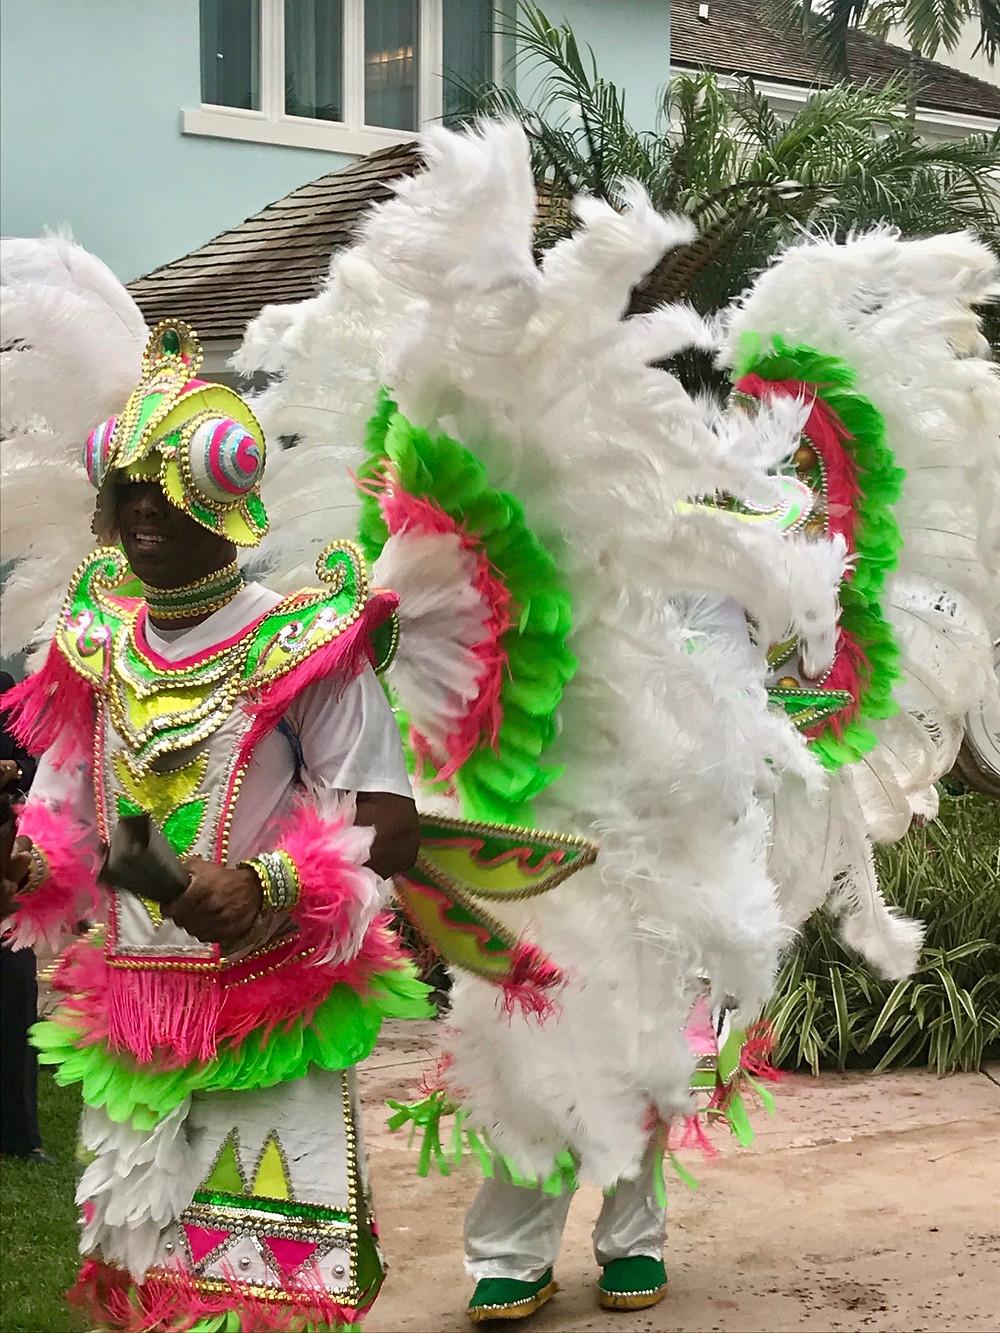 Festive musicians in costume